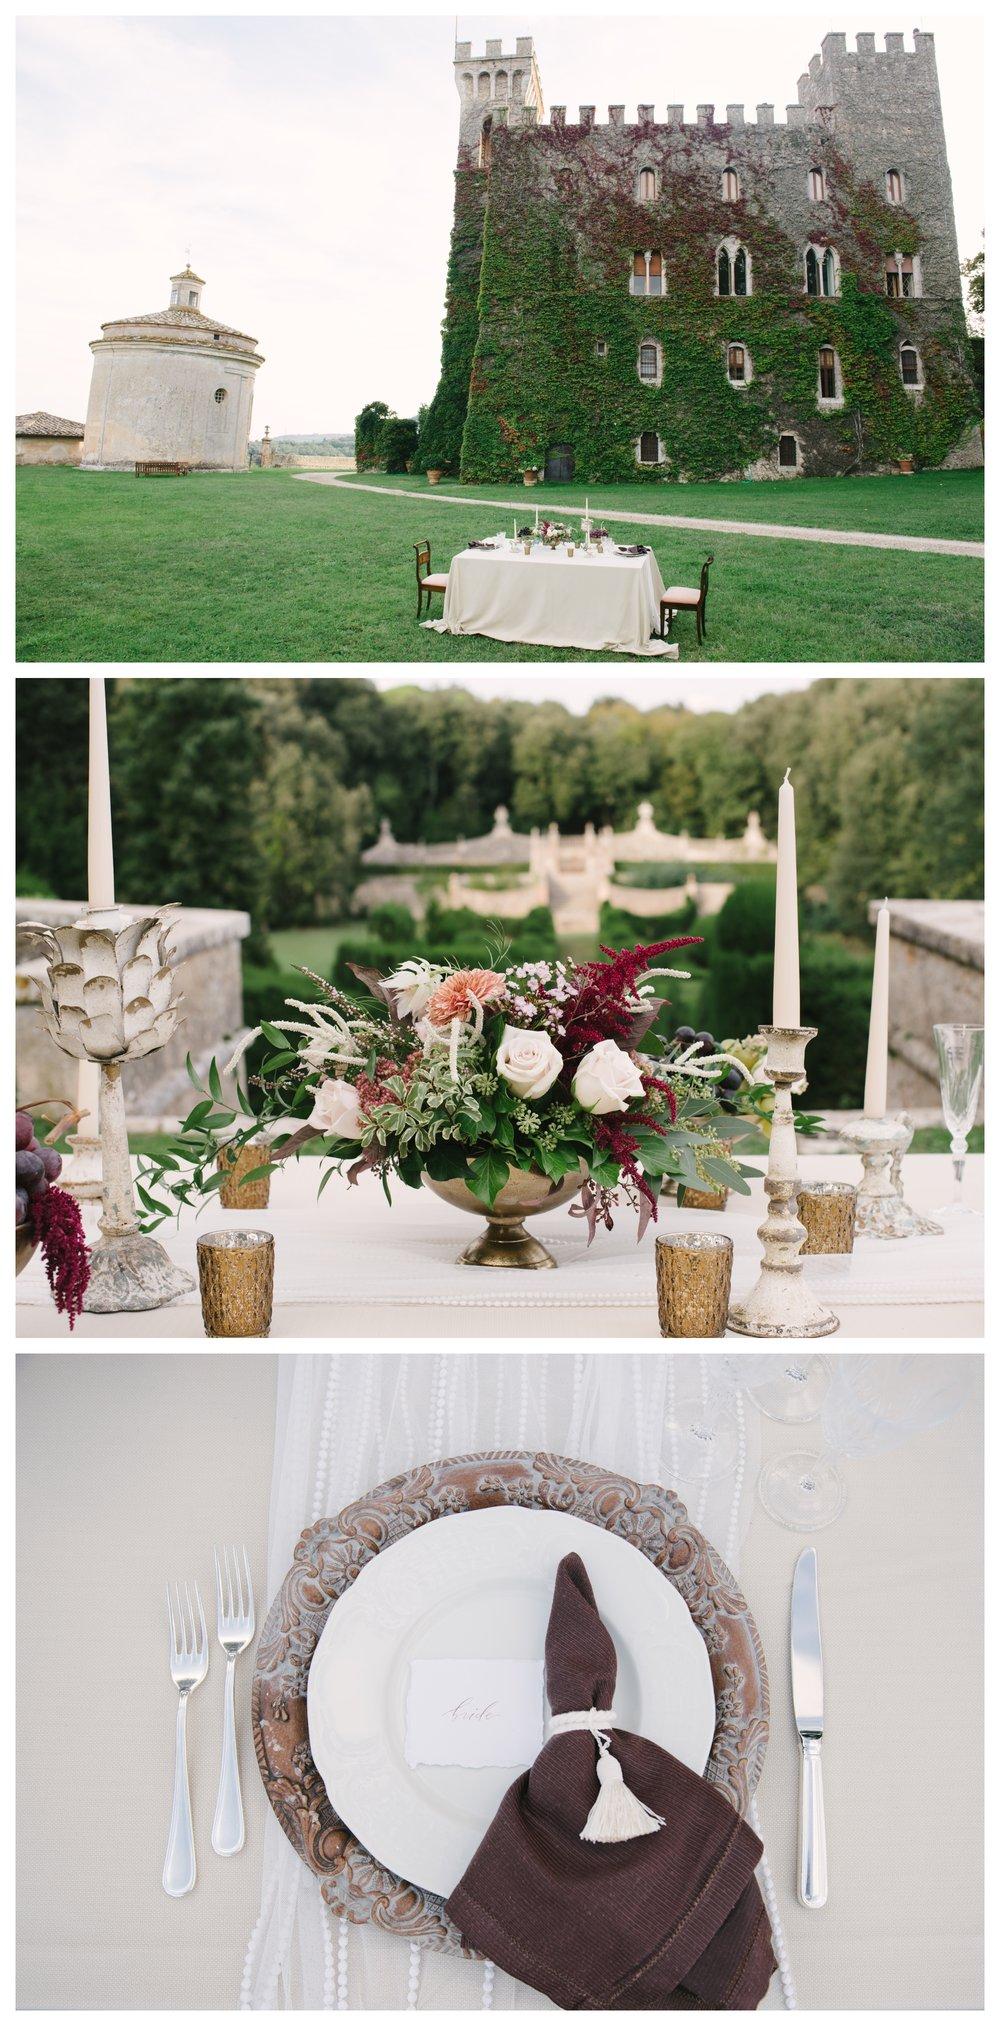 tuscany-castle-wedding-photographer-italy-williamsburgphotostudios-_0005.jpg